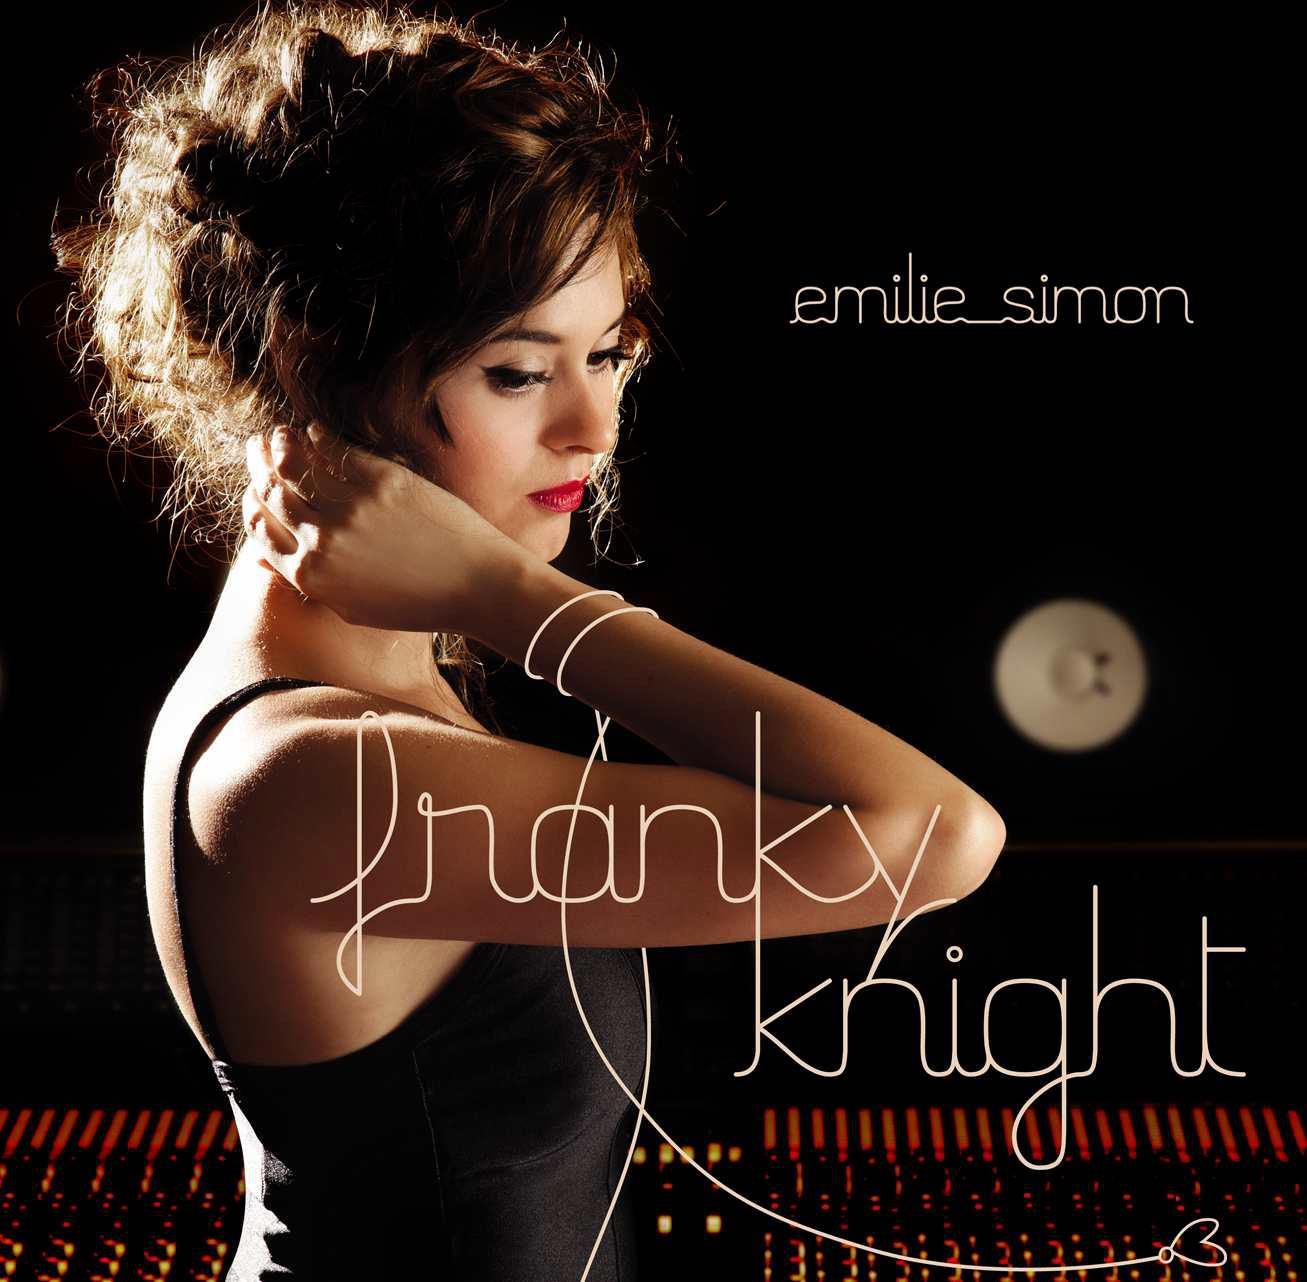 emilie-simon-franky-knight